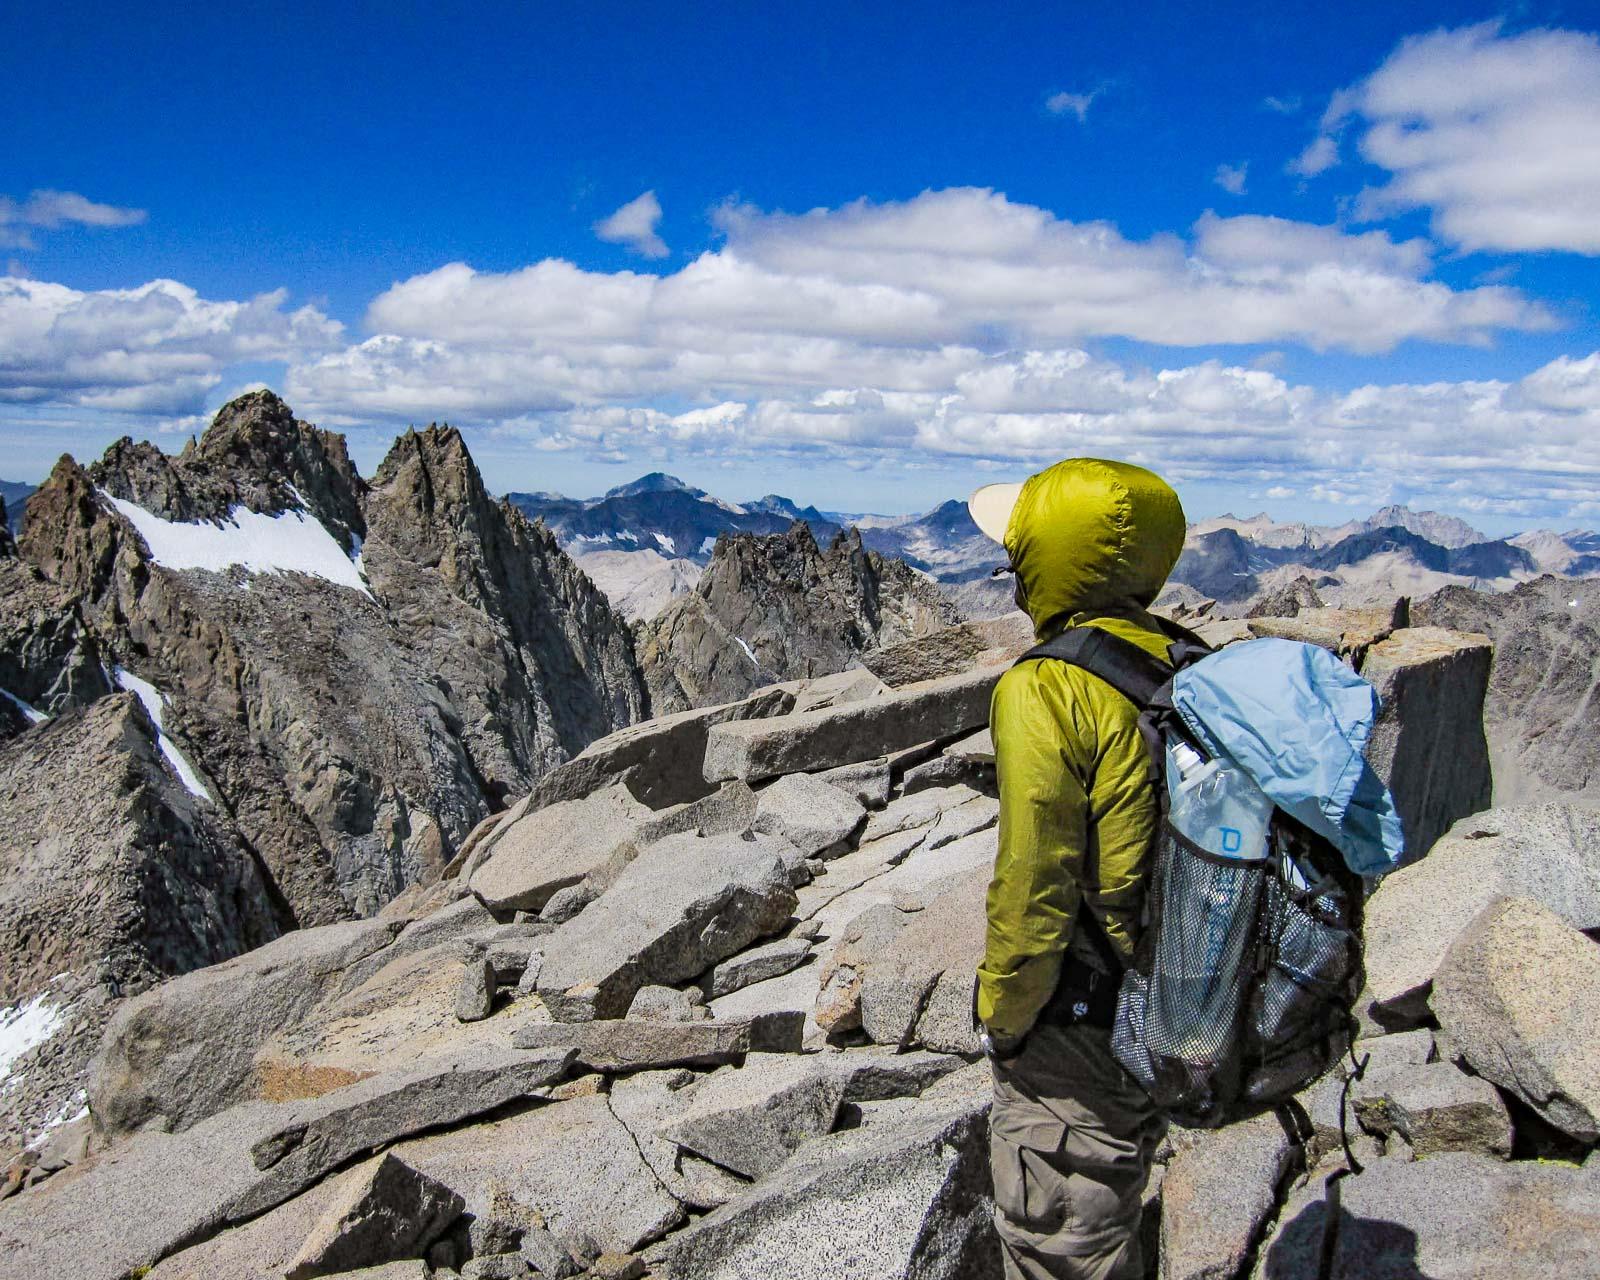 Summit of Mt Sill in Sierra Nevada